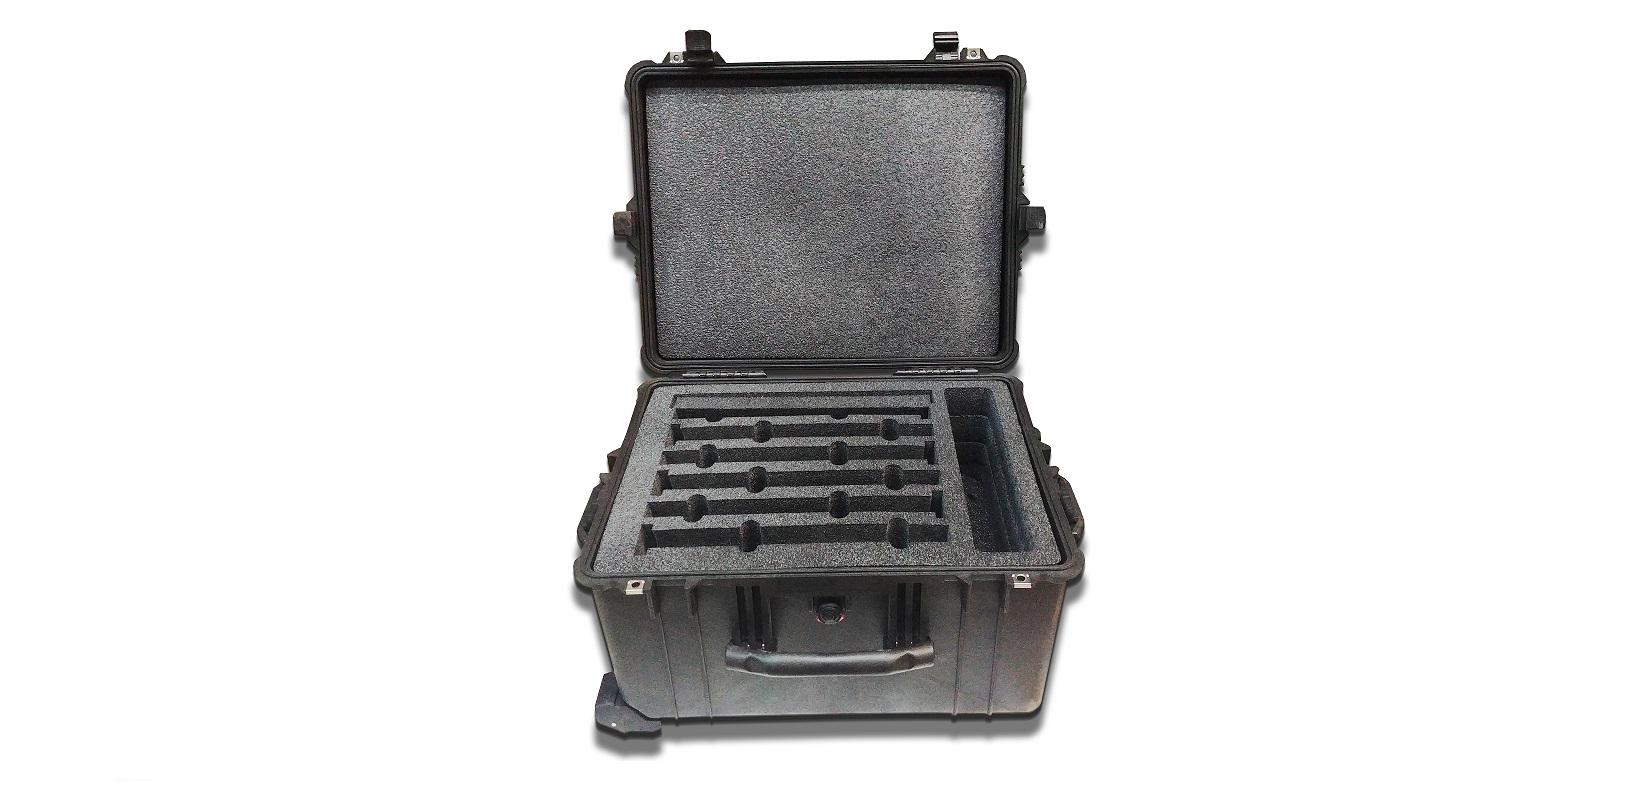 Pelican 1620-F0107-0615 Custom 1620 Protector Case With Foam